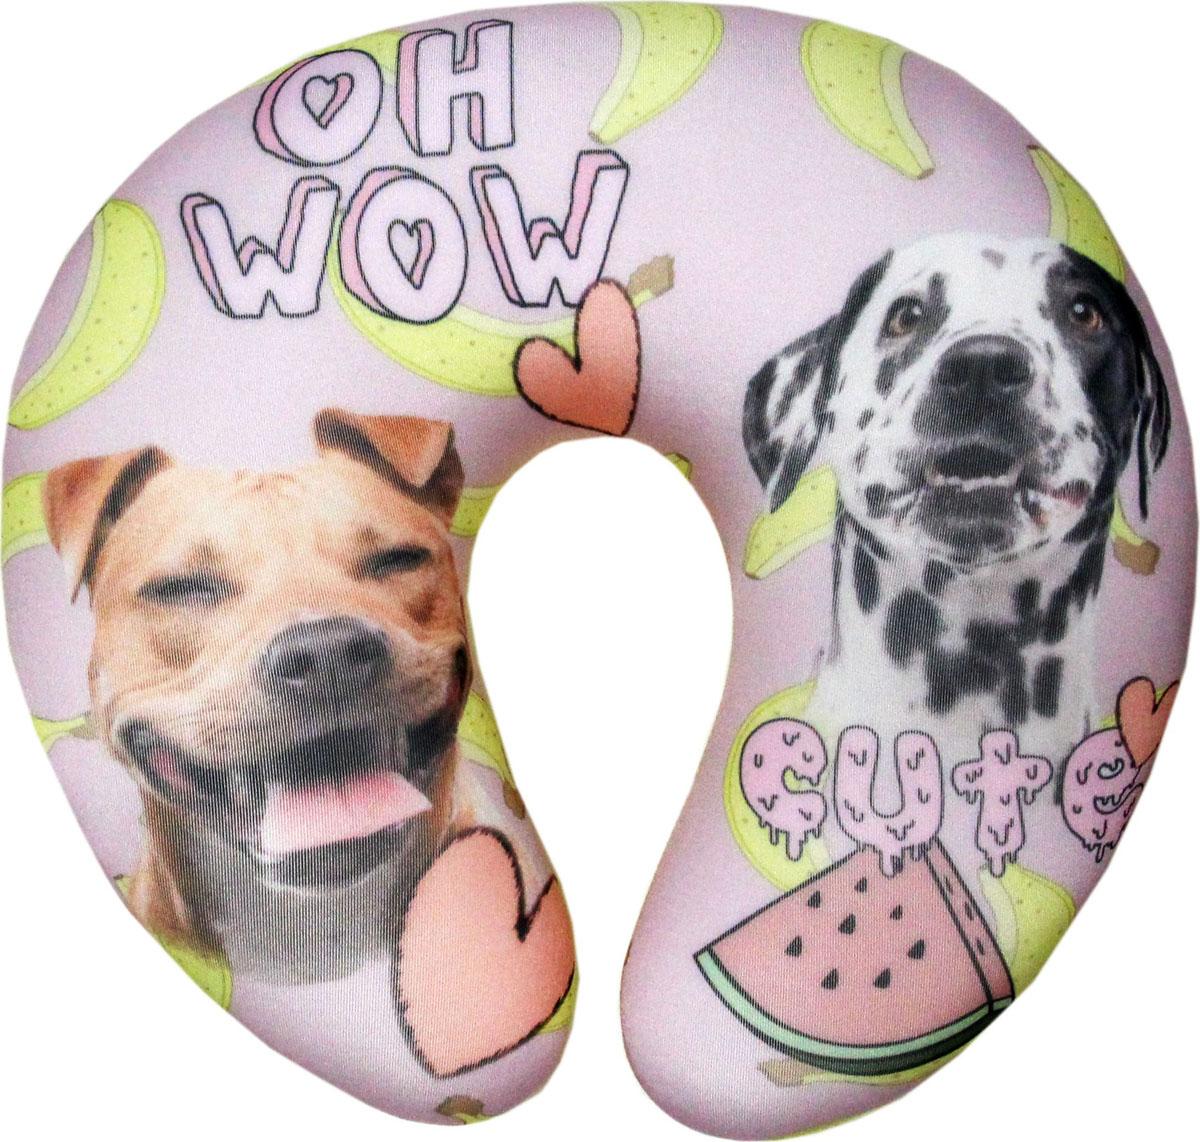 Подушка-антистресс для шеи Собаки пара, цвет: розовый, 30 х 27 см подушка антистресс для шеи армейский 30 х 27 см 16асп32ив 1